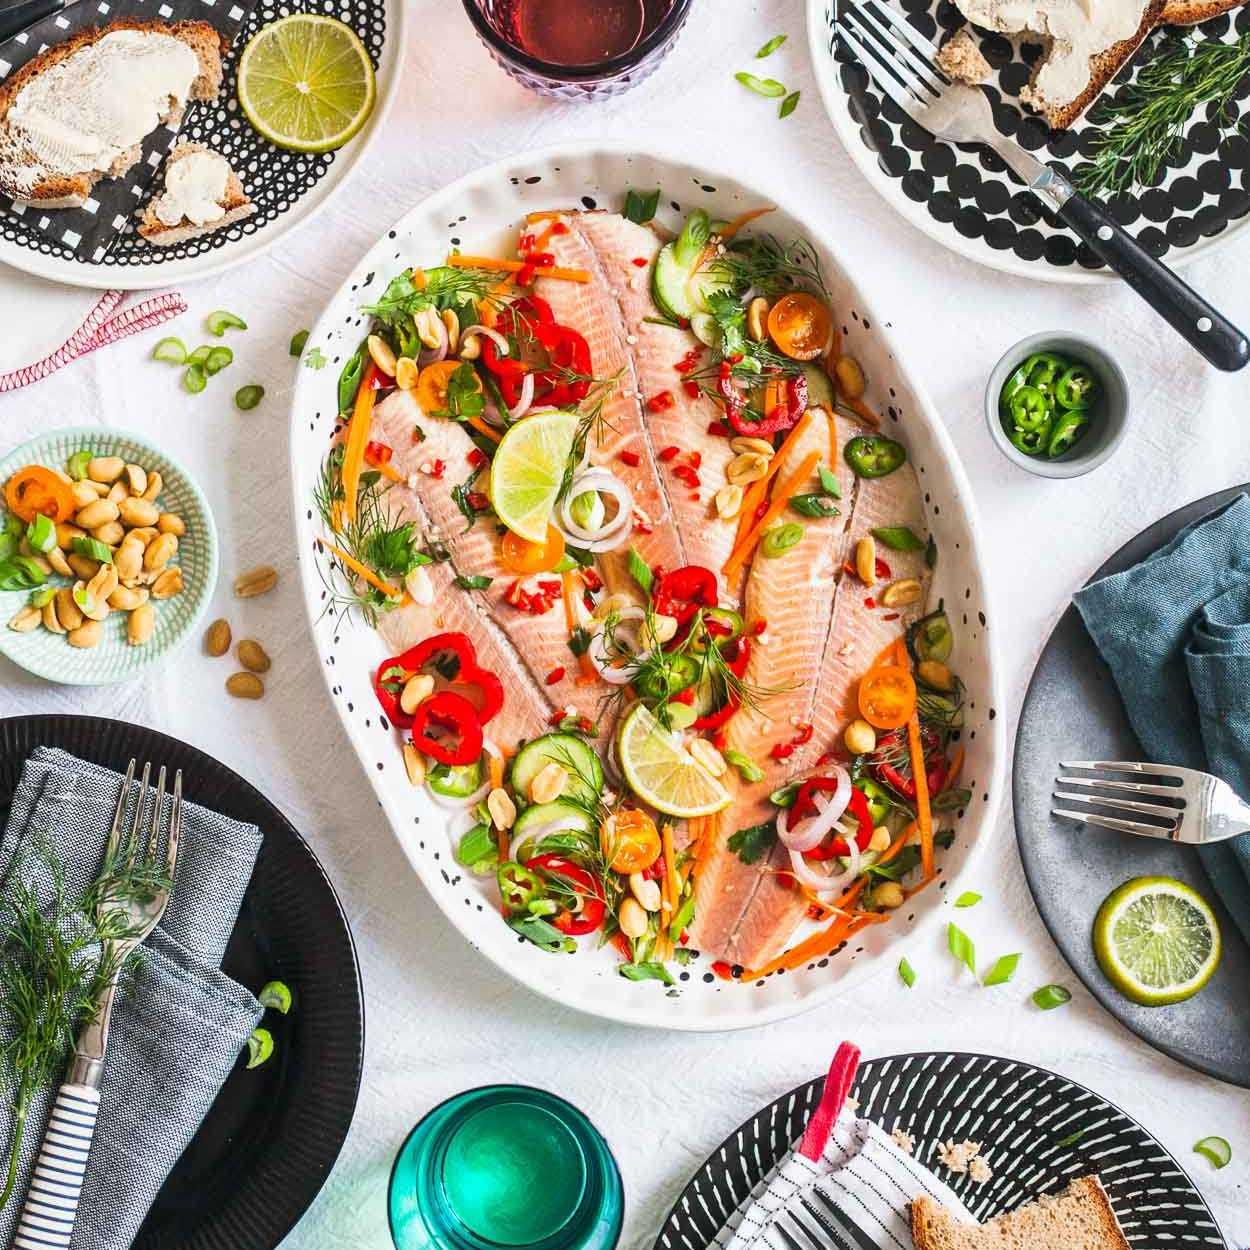 Bachsaibling Nuoc Cham in vietnamesischem Dressing Fischplatte Brunch |GourmetGuerilla.de